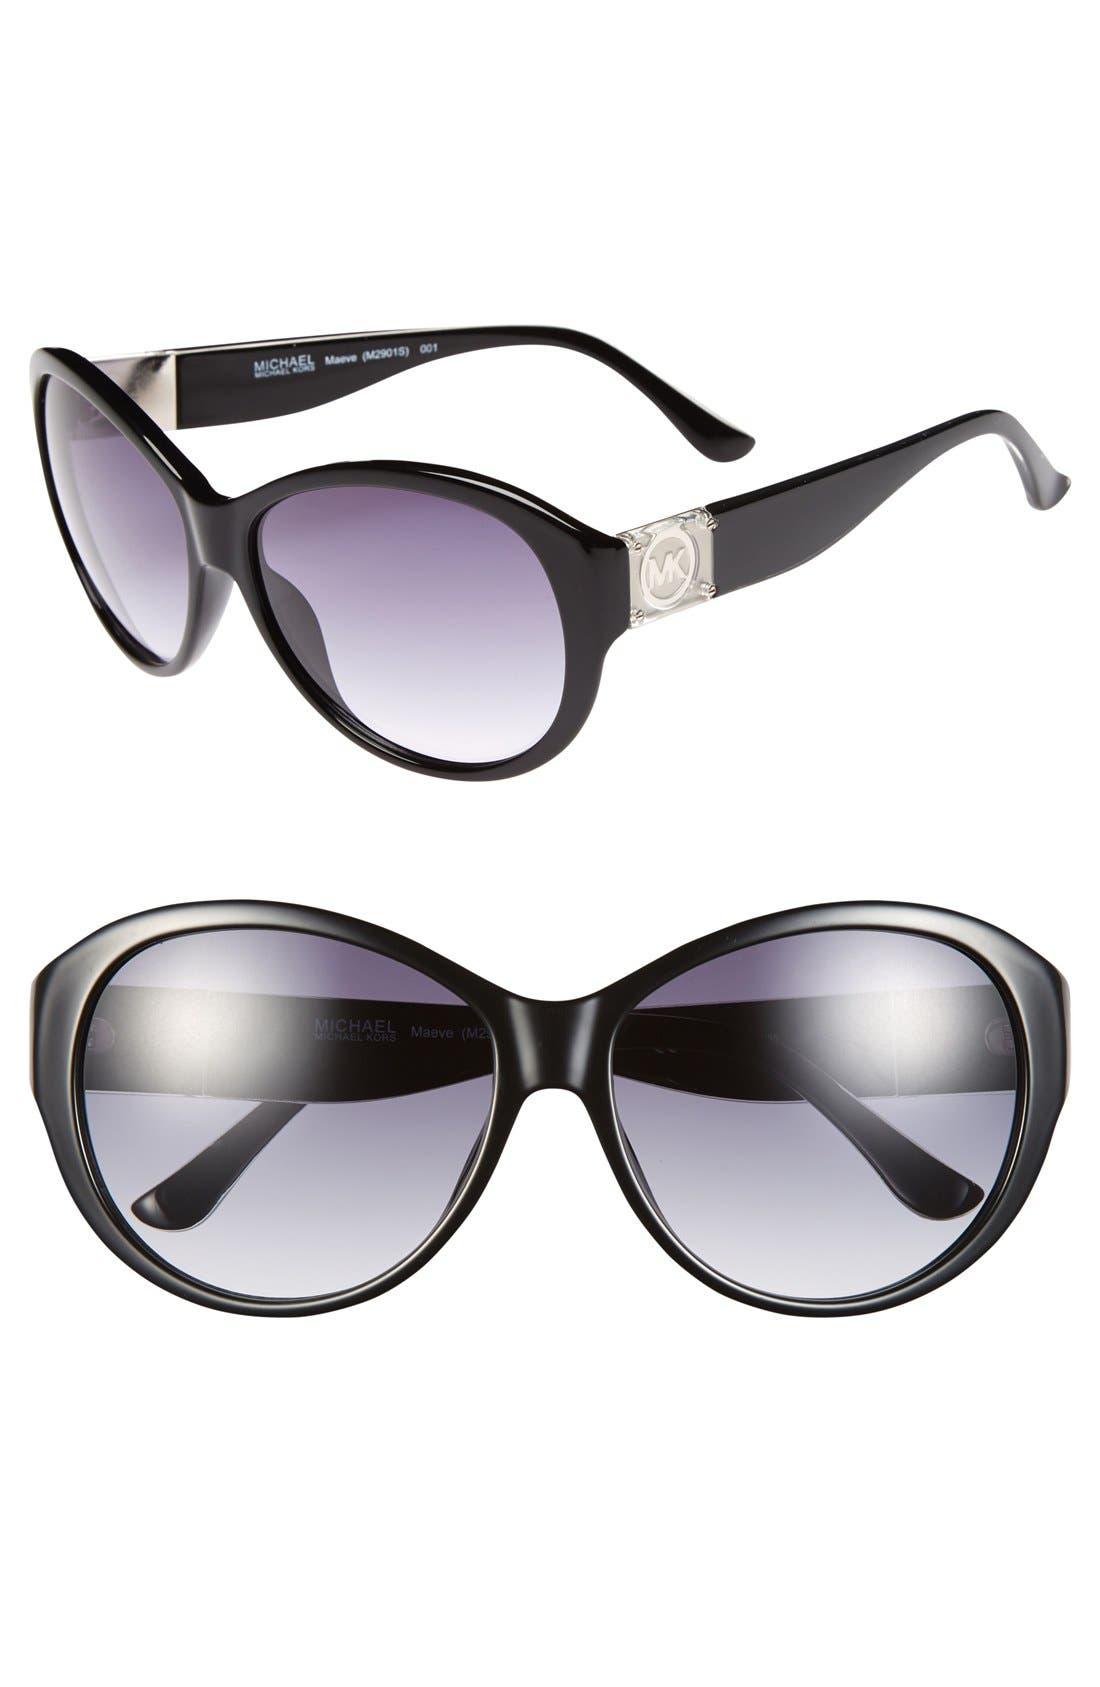 Main Image - MICHAEL Michael Kors 'Maeve' 61mm Sunglasses